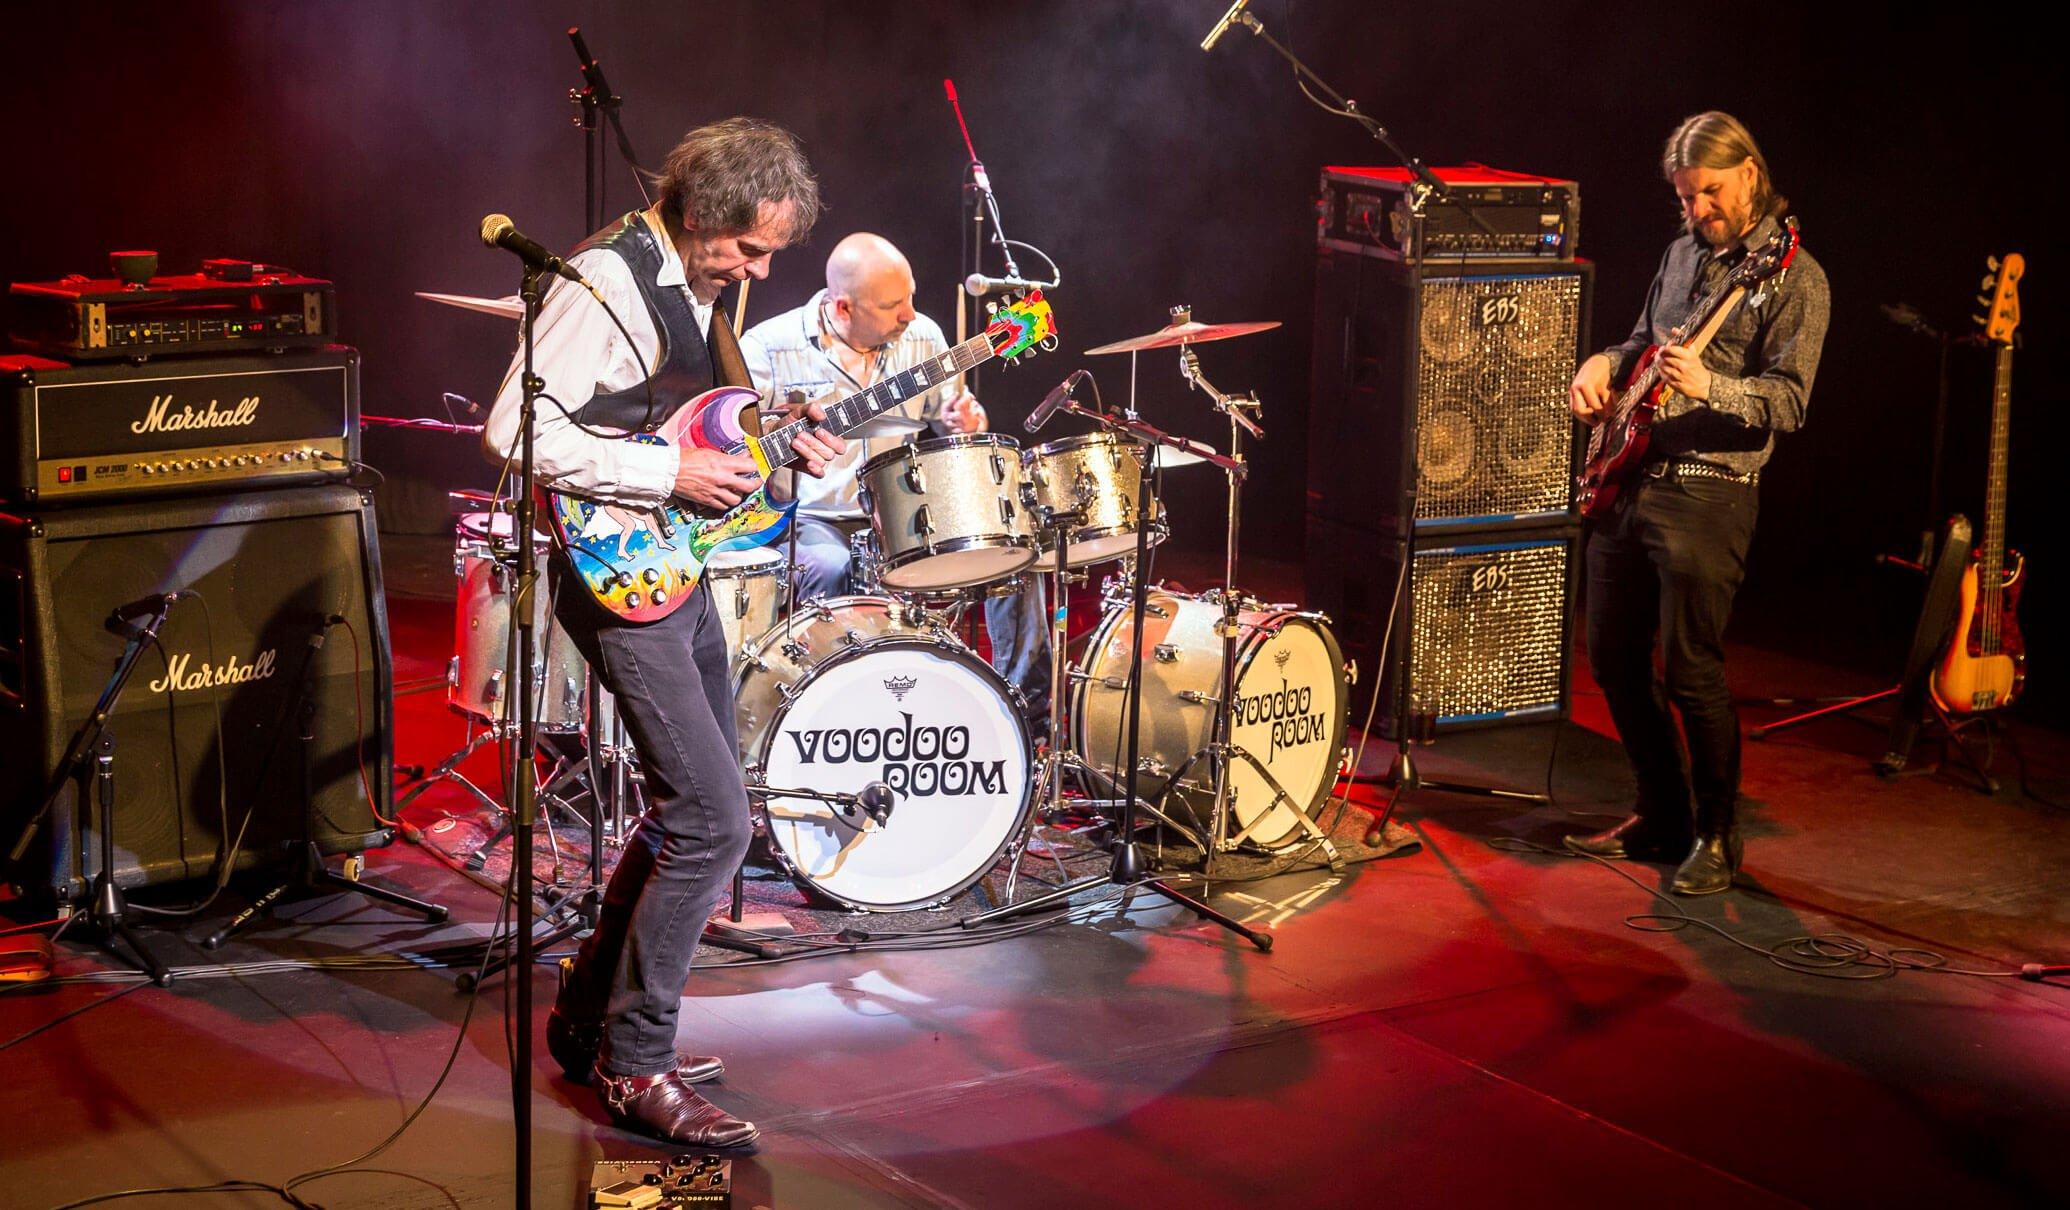 Voodoo Room - A Night of Hendrix, Clapton & Cream